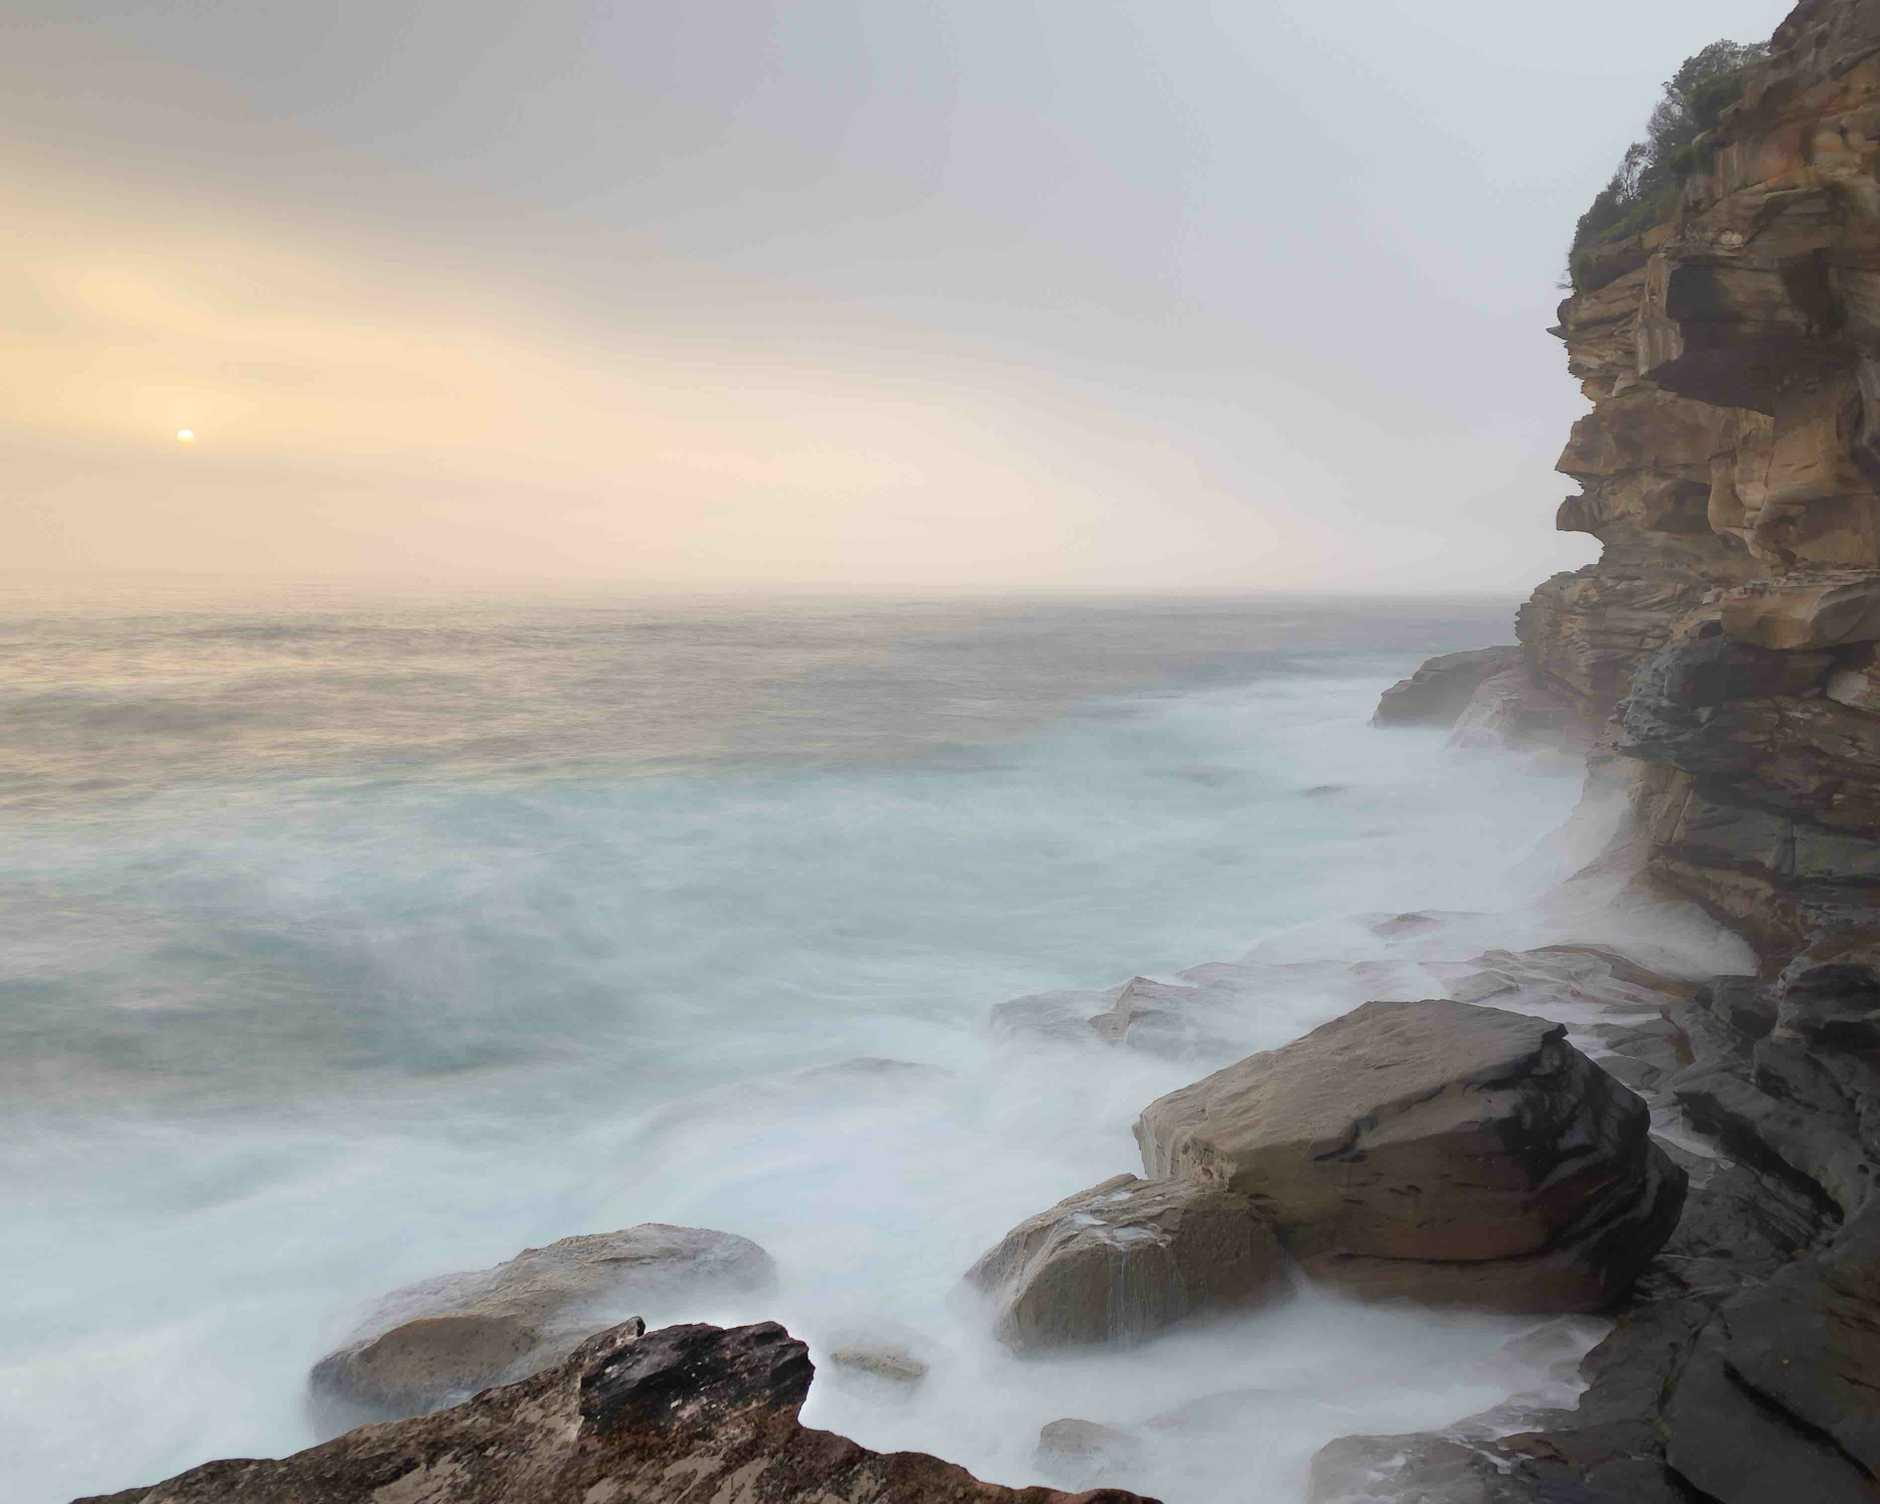 Bronte Beach, 6:04am, iPhone XS Max, SlowShutter